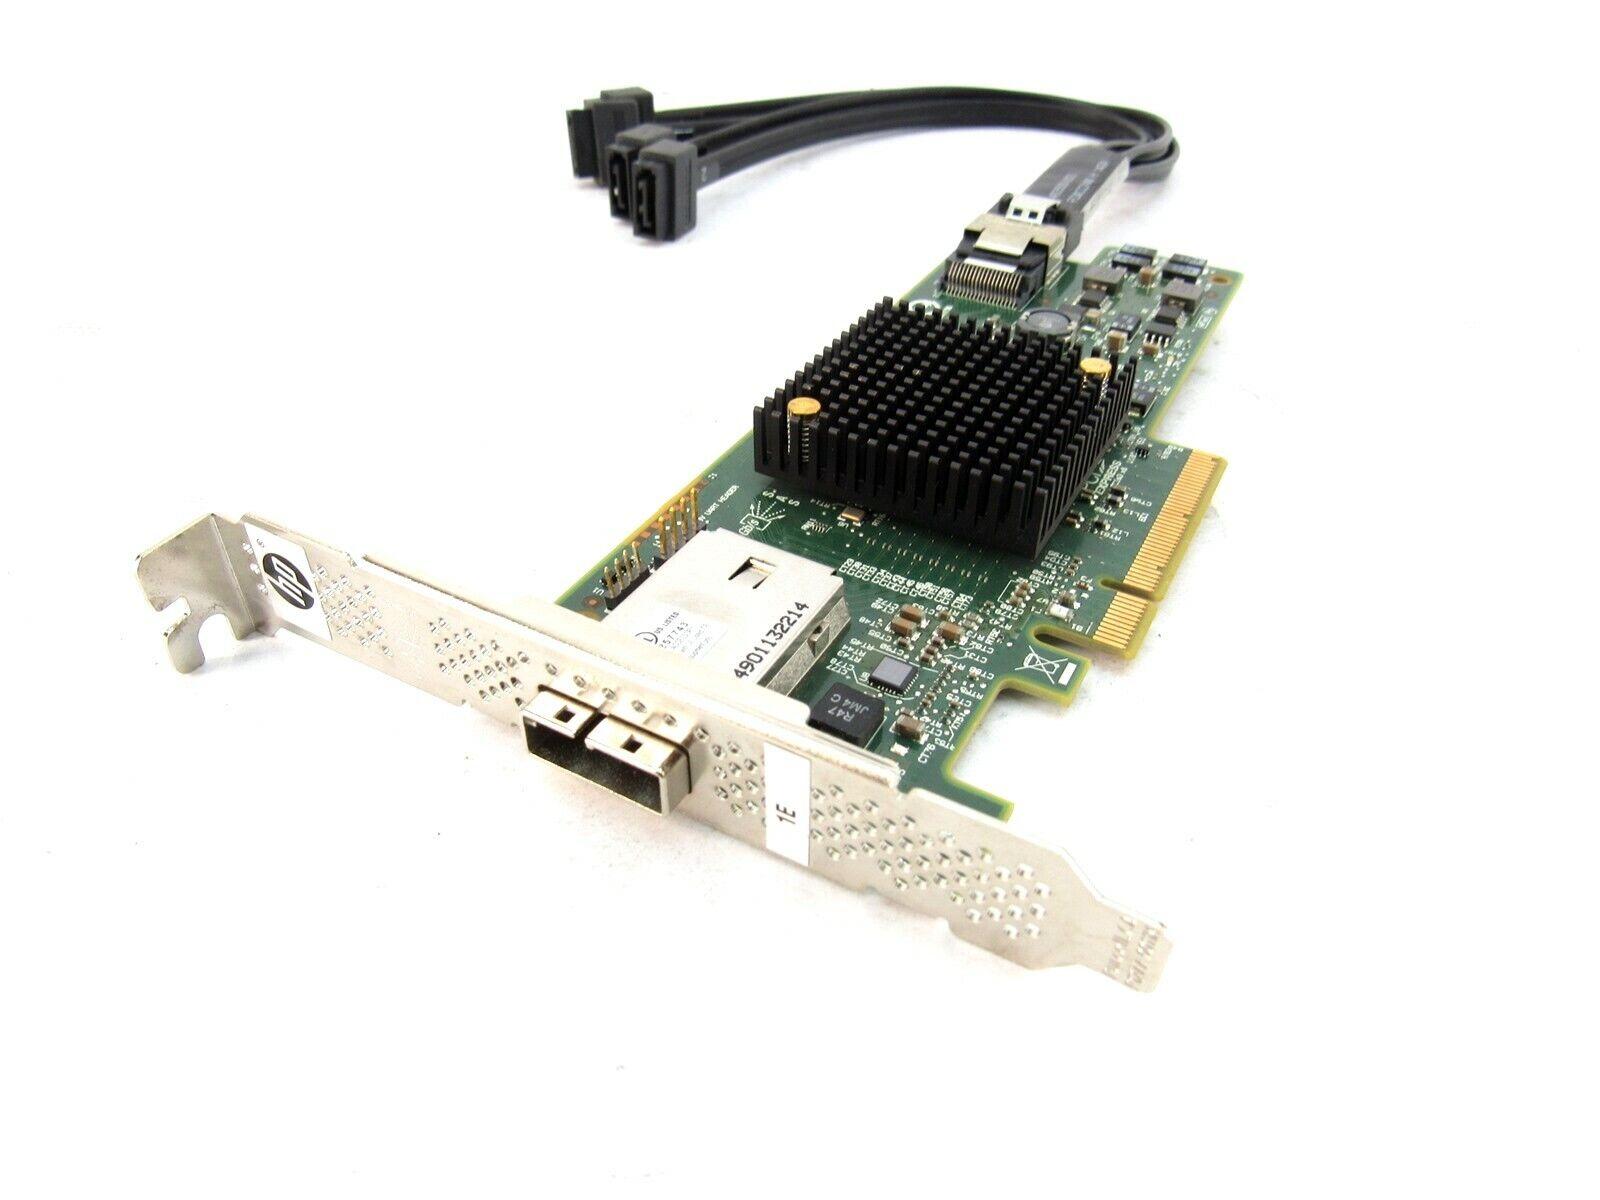 Details about HP SAS9217-4i4e PCIe x8 6GB SAS RAID Controller 725904-001